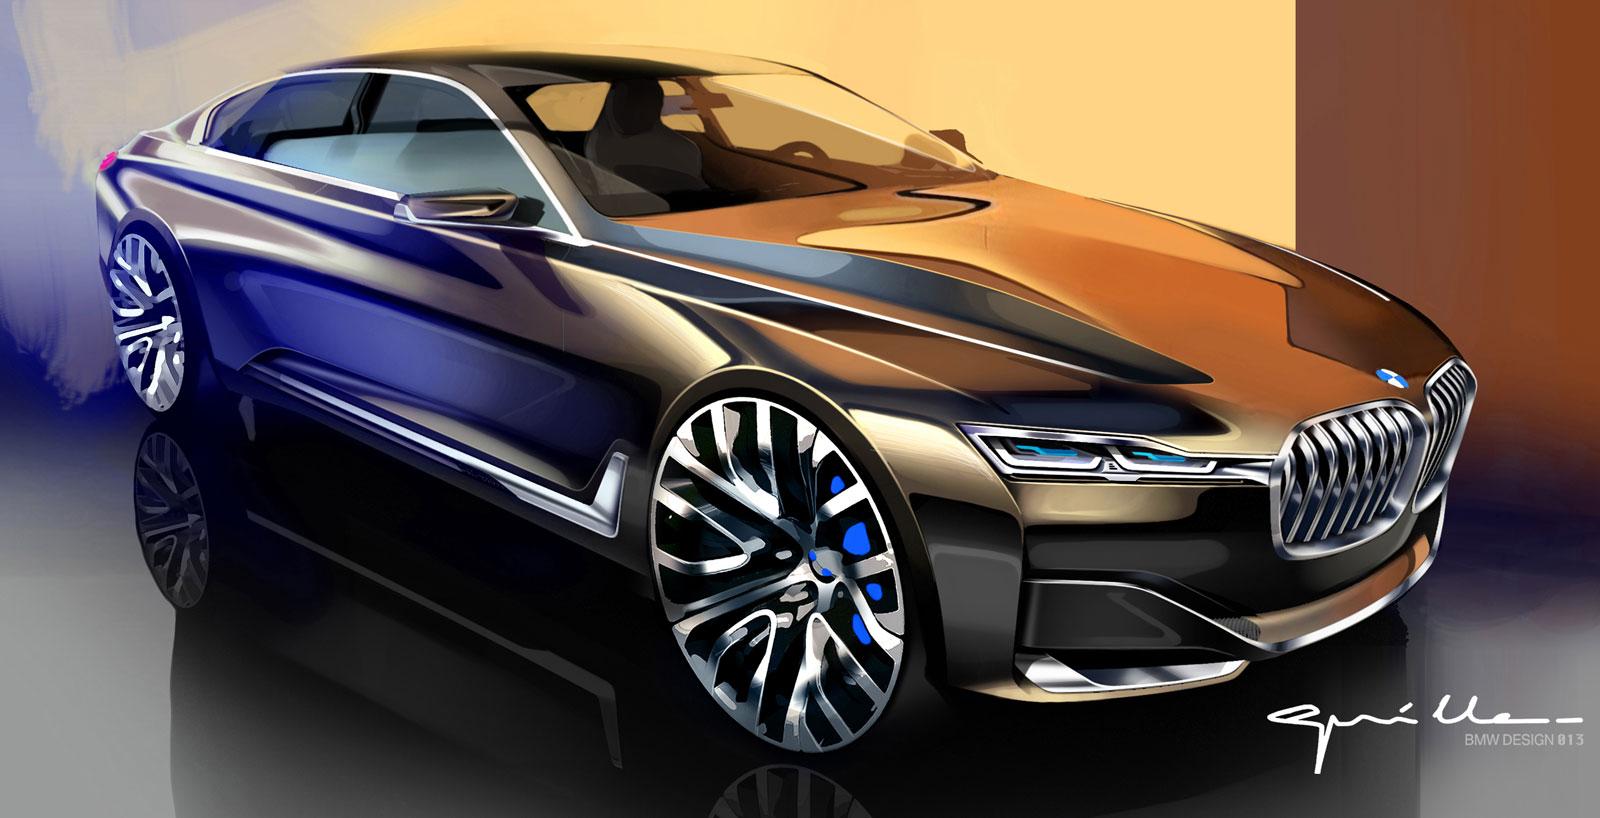 Bmw Vision Future Luxury Concept Design Sketch By Nicolas Guille Car Body Design